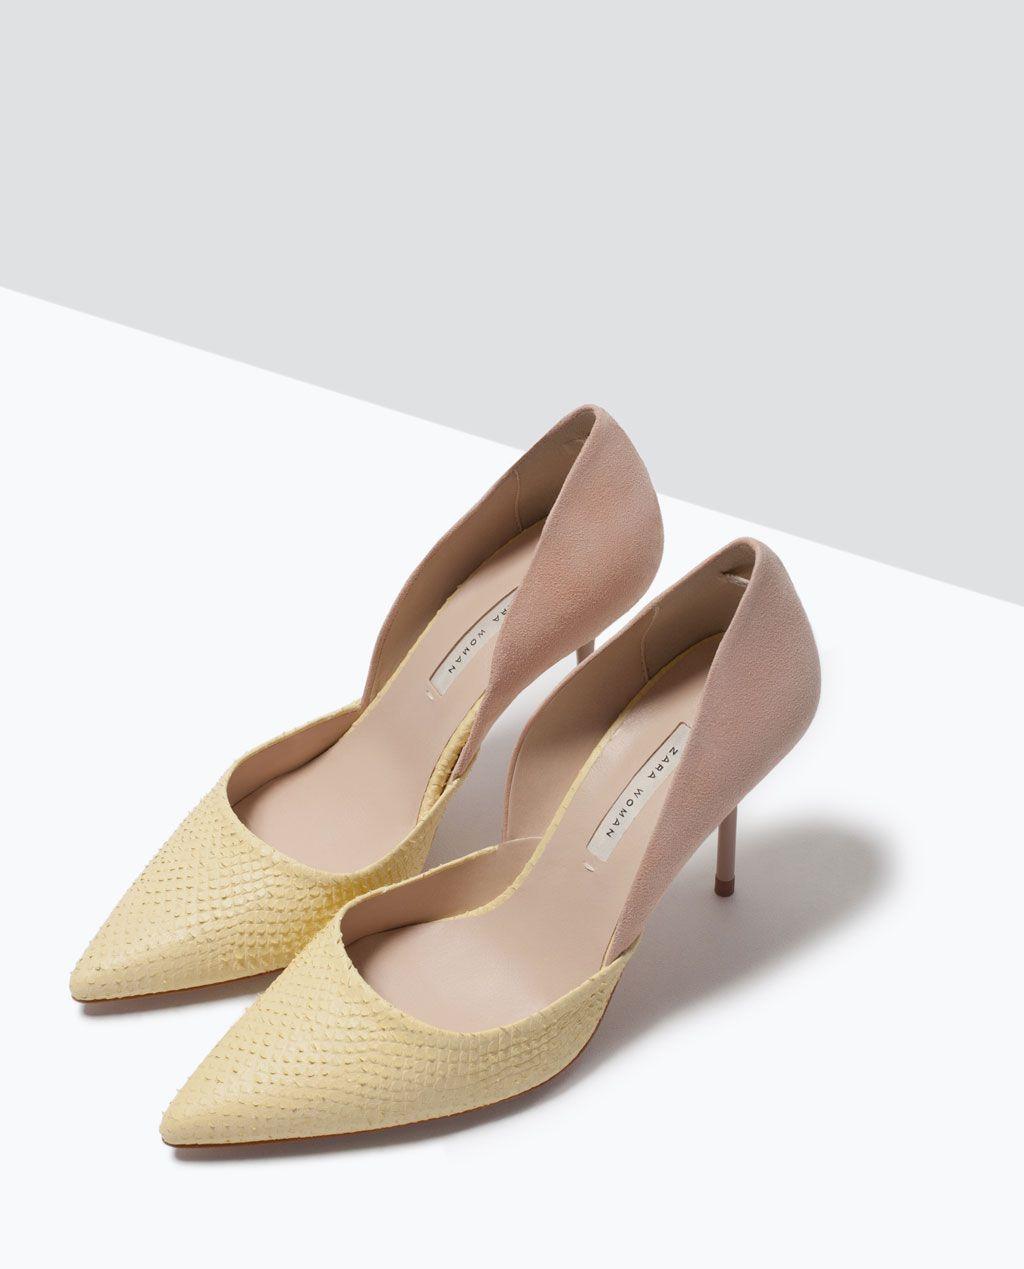 Zara Bags Leather amp; Asymmetric Combined Shoes Court ET6Eqwxra